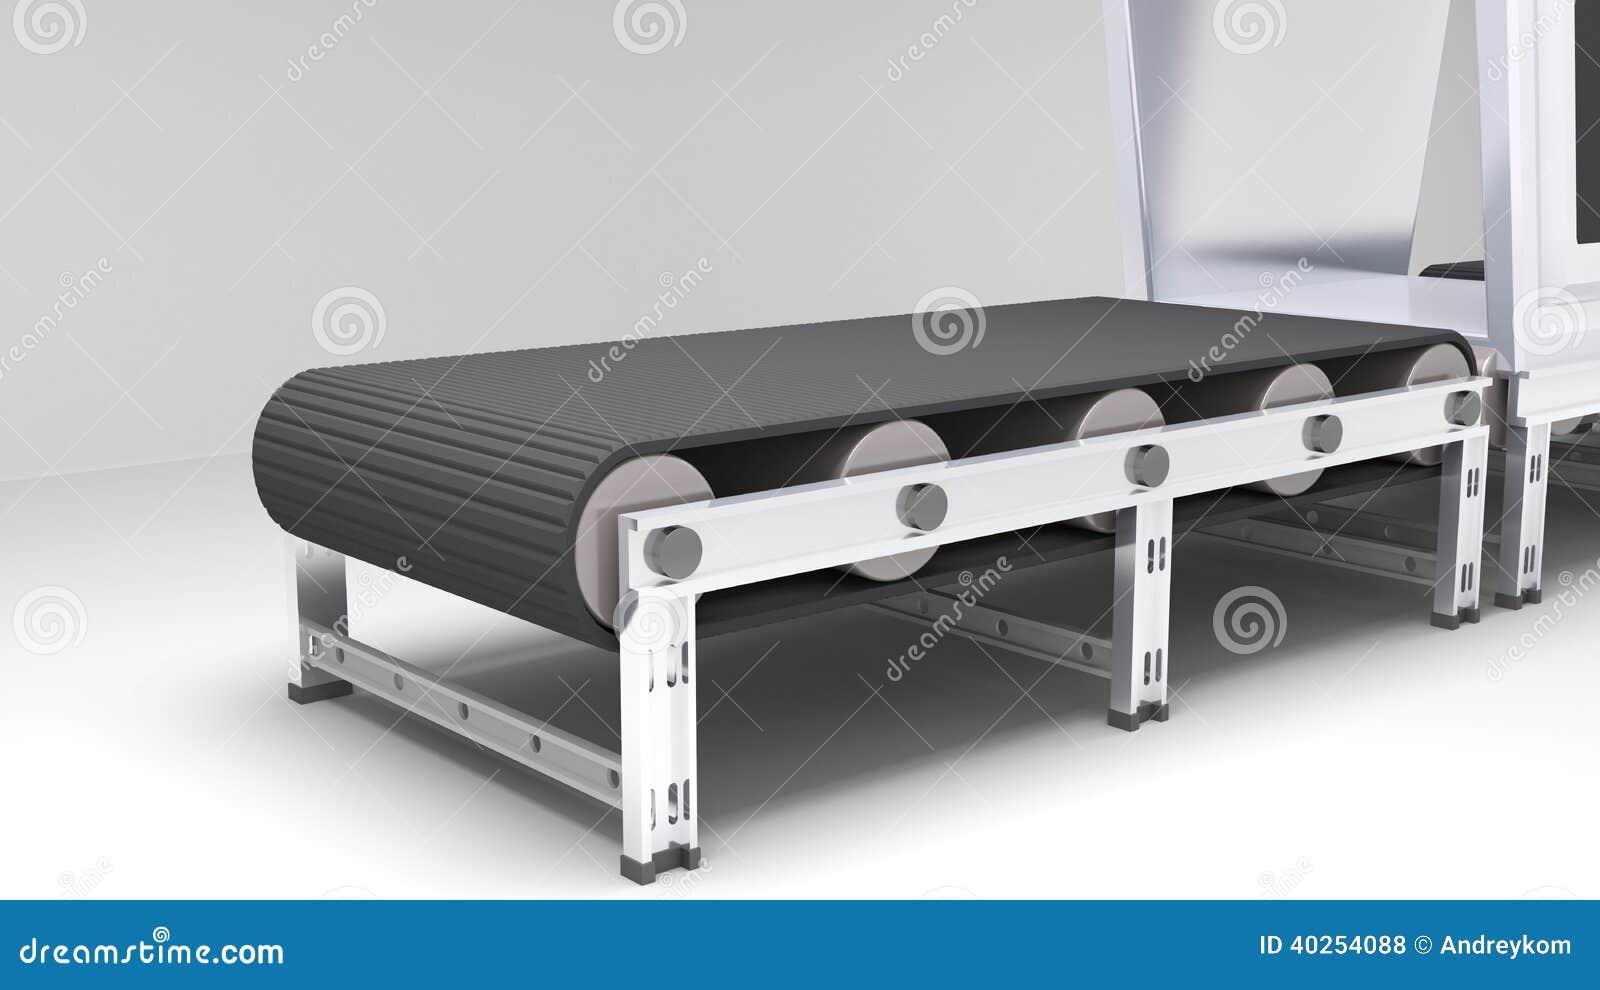 Penis art conveyor belt 7